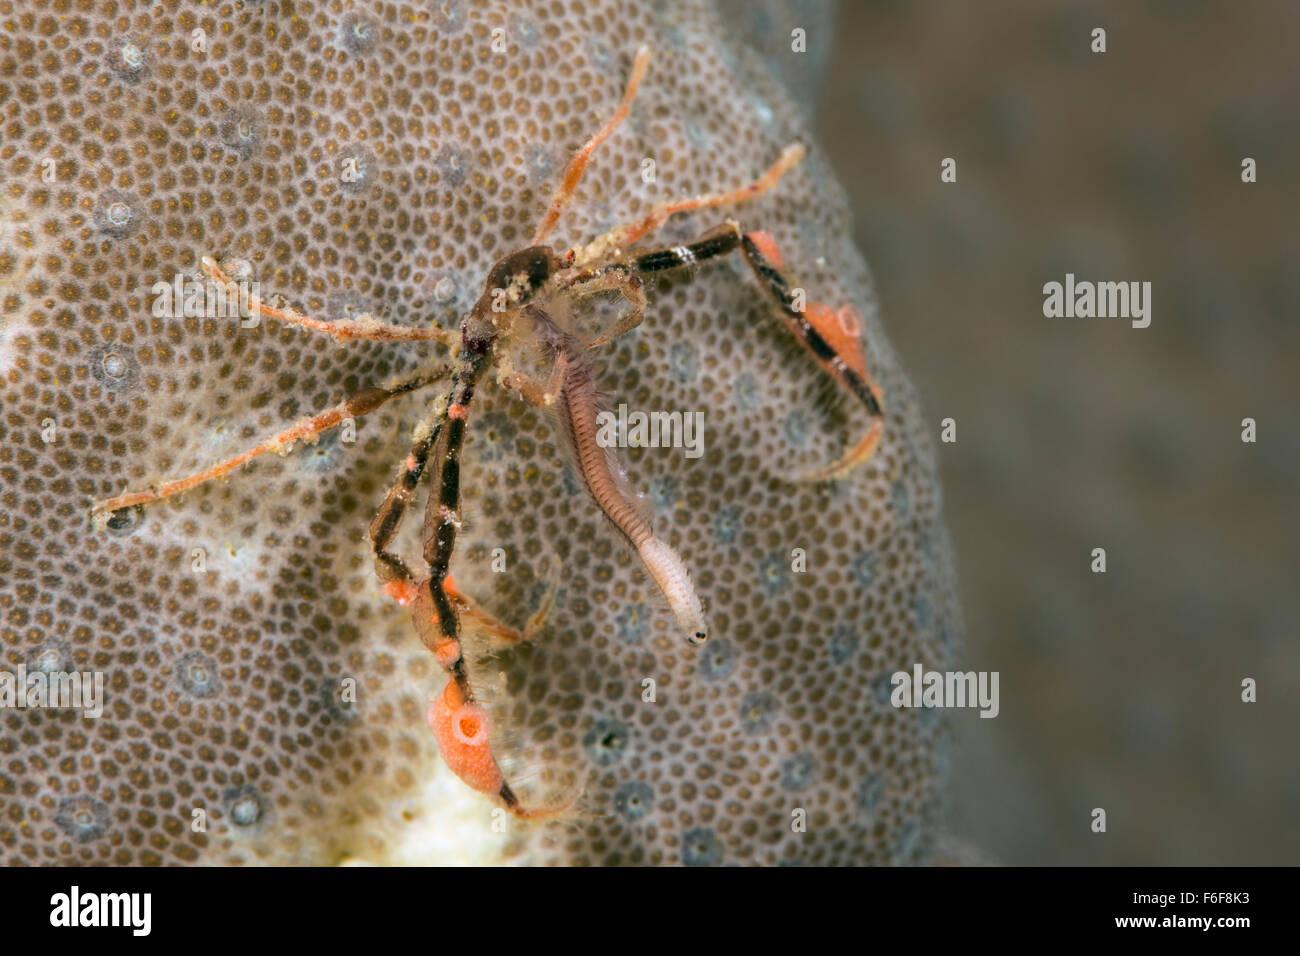 Spider Crab feeds on Worm, Achaeus japonicus, Flores, Indonesia - Stock Image